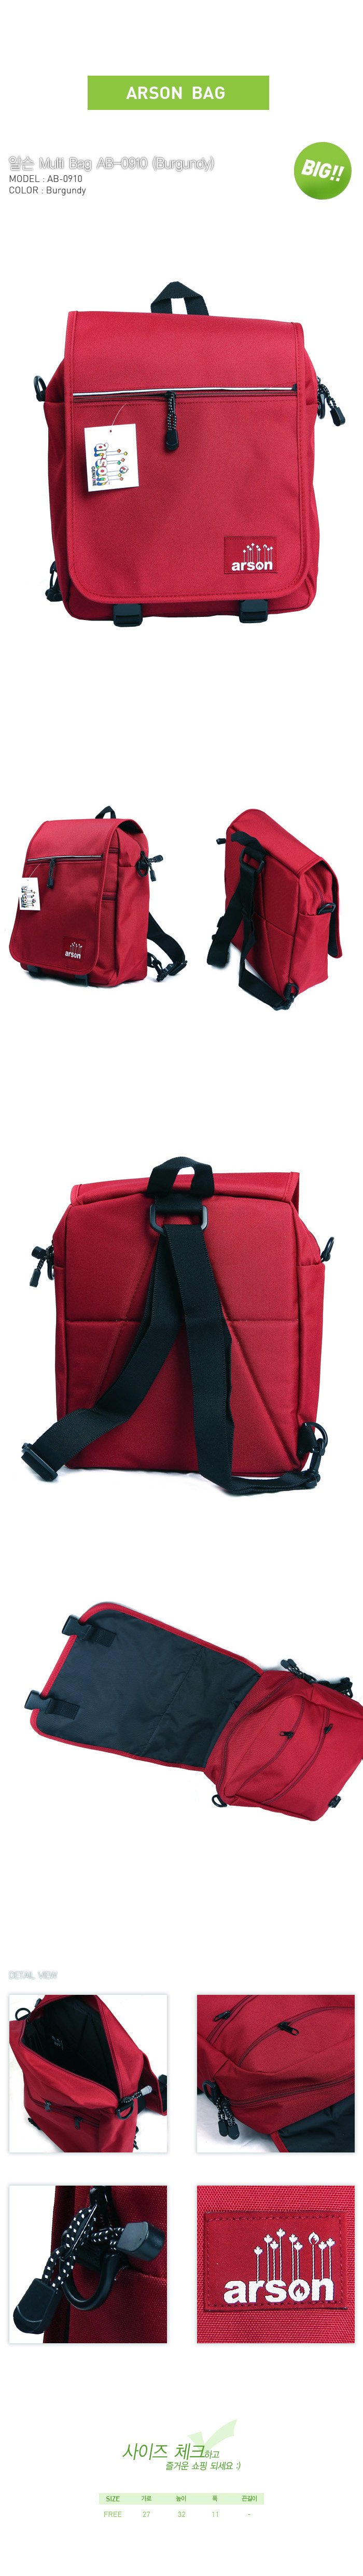 [ ARSON ] AB-0910 (Burgundy)/Backpack School Cross Bag